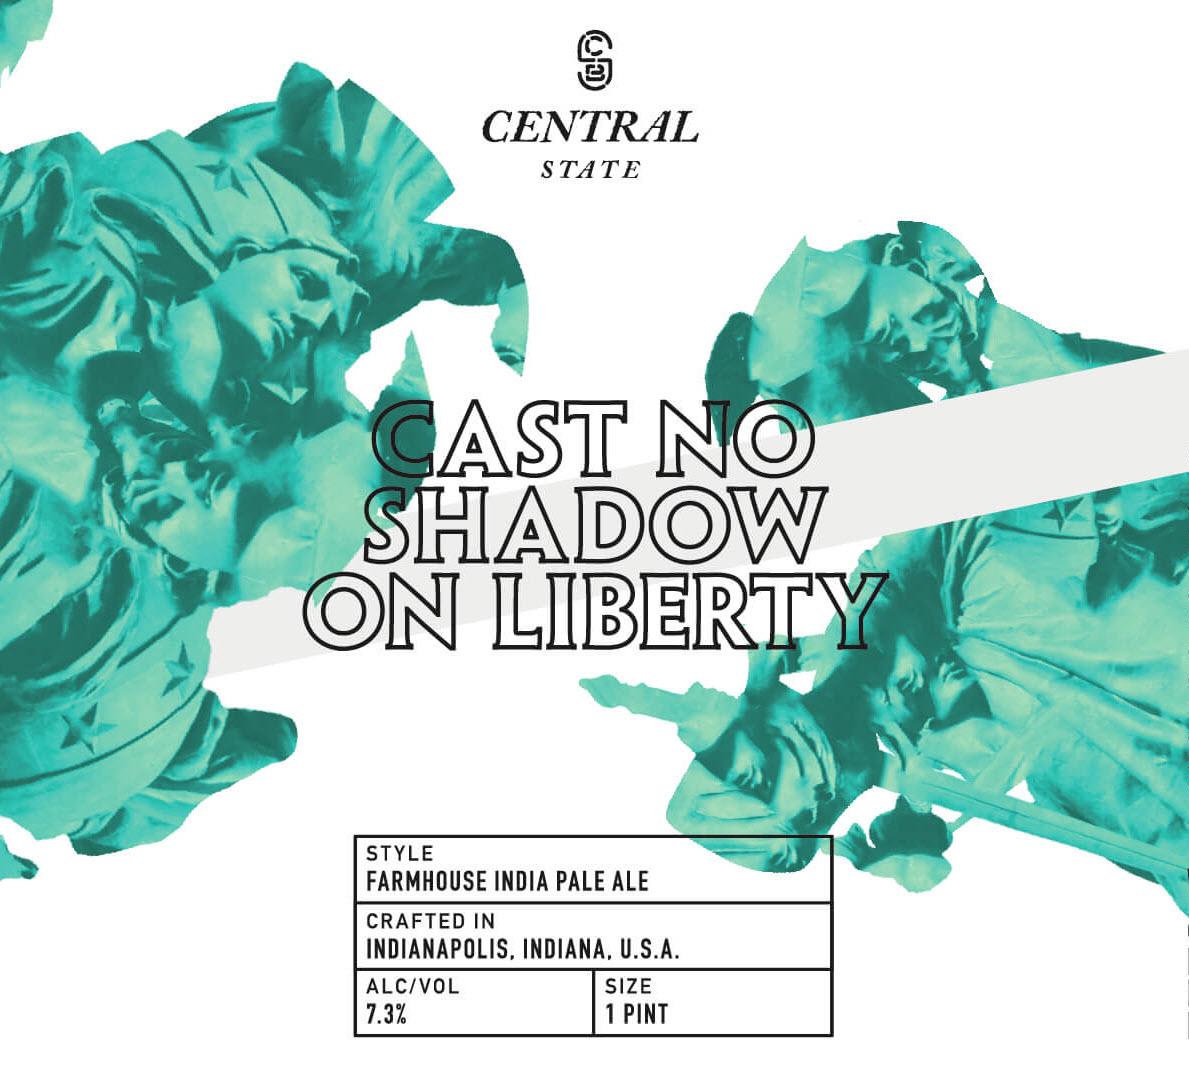 CSB_CastNoShadow_16oz_StickerLabel_Final.jpg